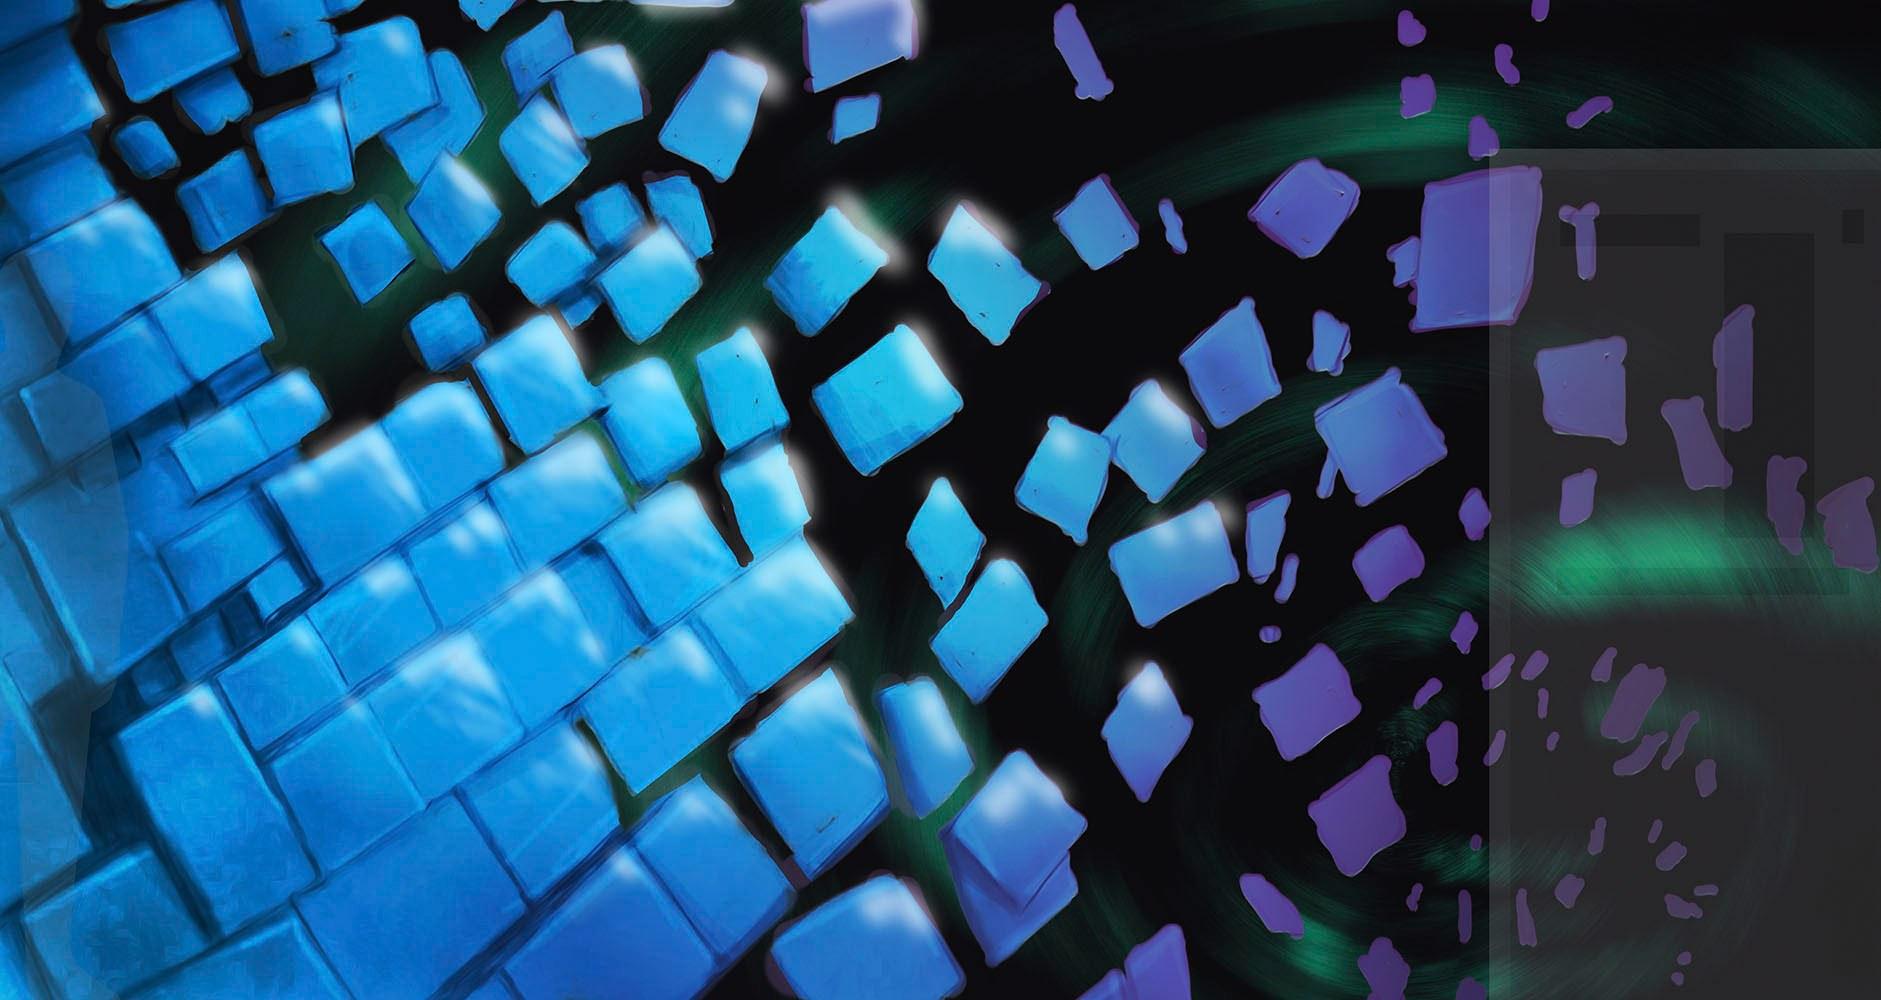 Modern Pixel-like Boxes Concept Wall Art